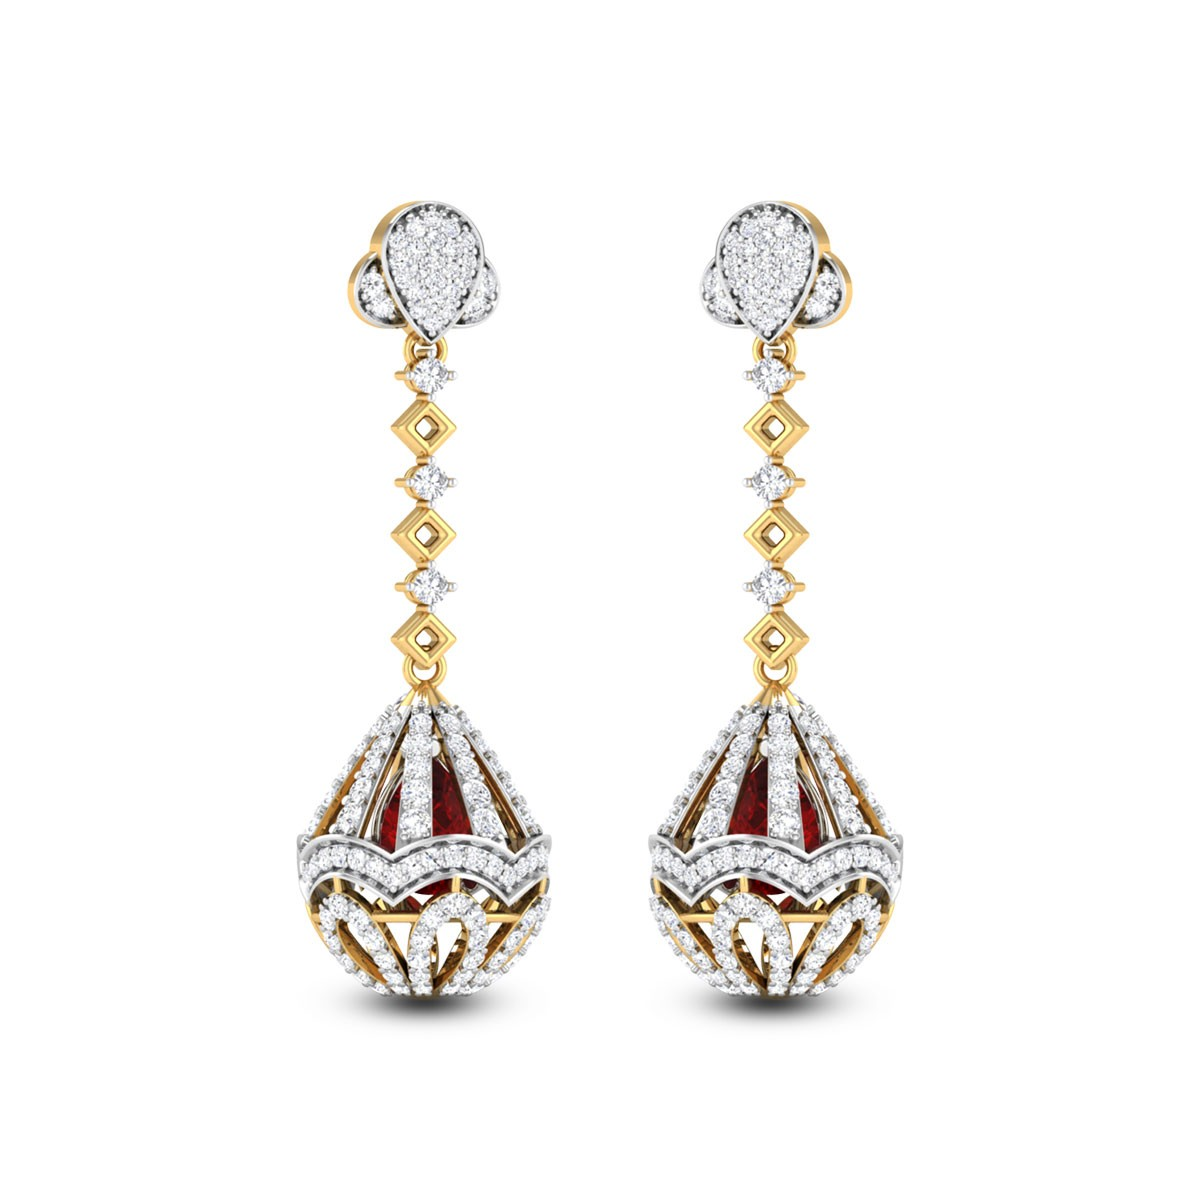 Dropping Elliptical Diamond Earrings